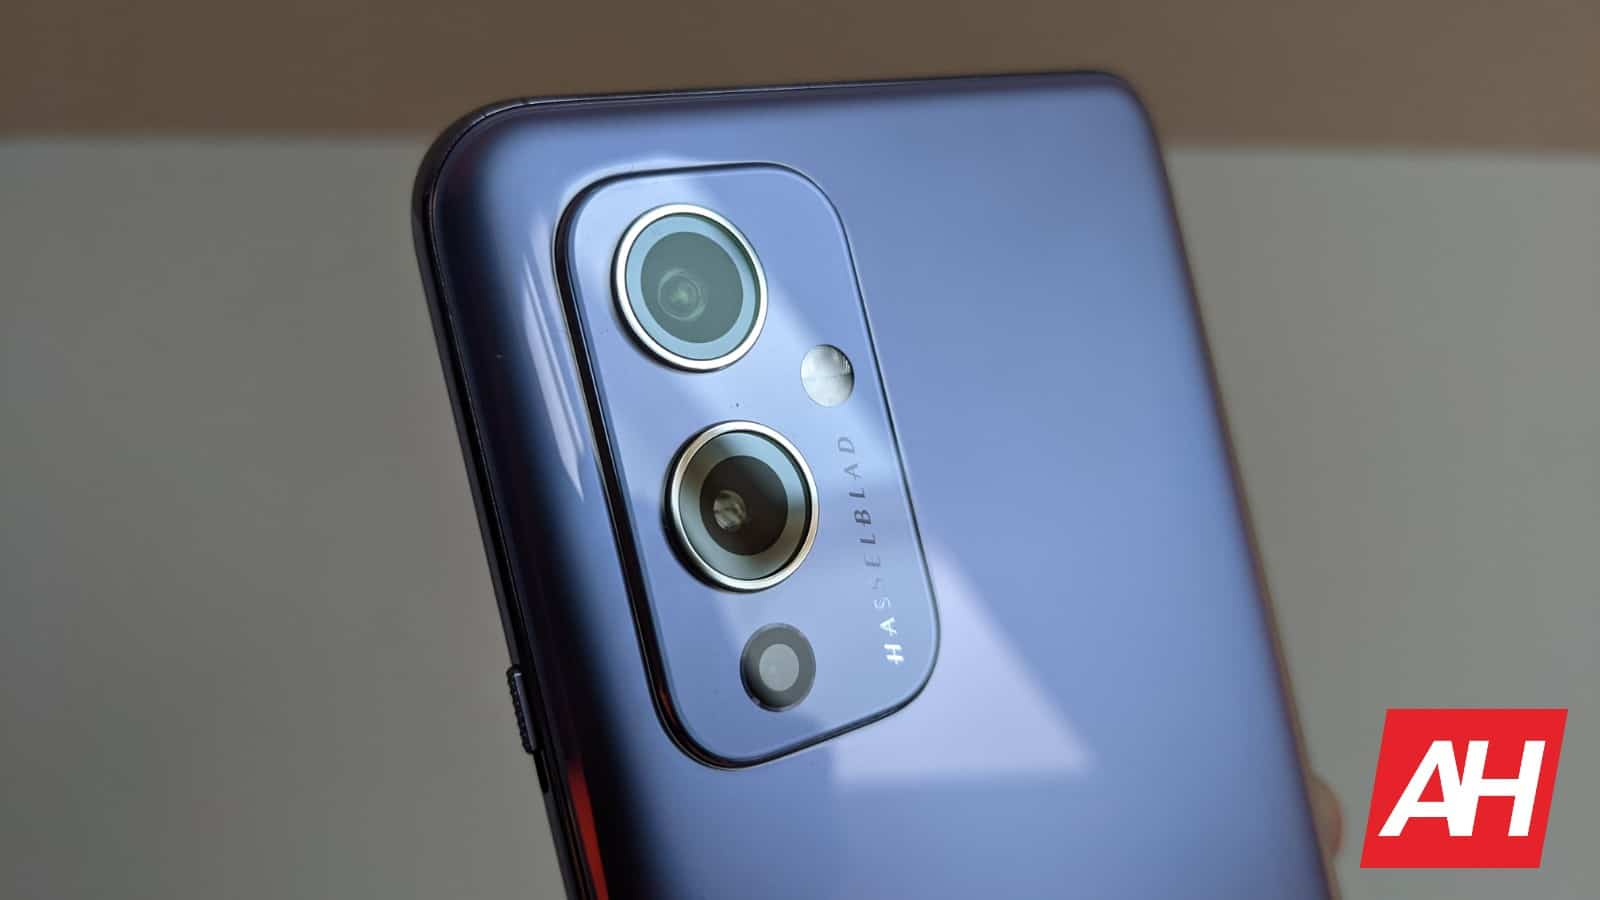 AH OnePlus 9 KL image 43